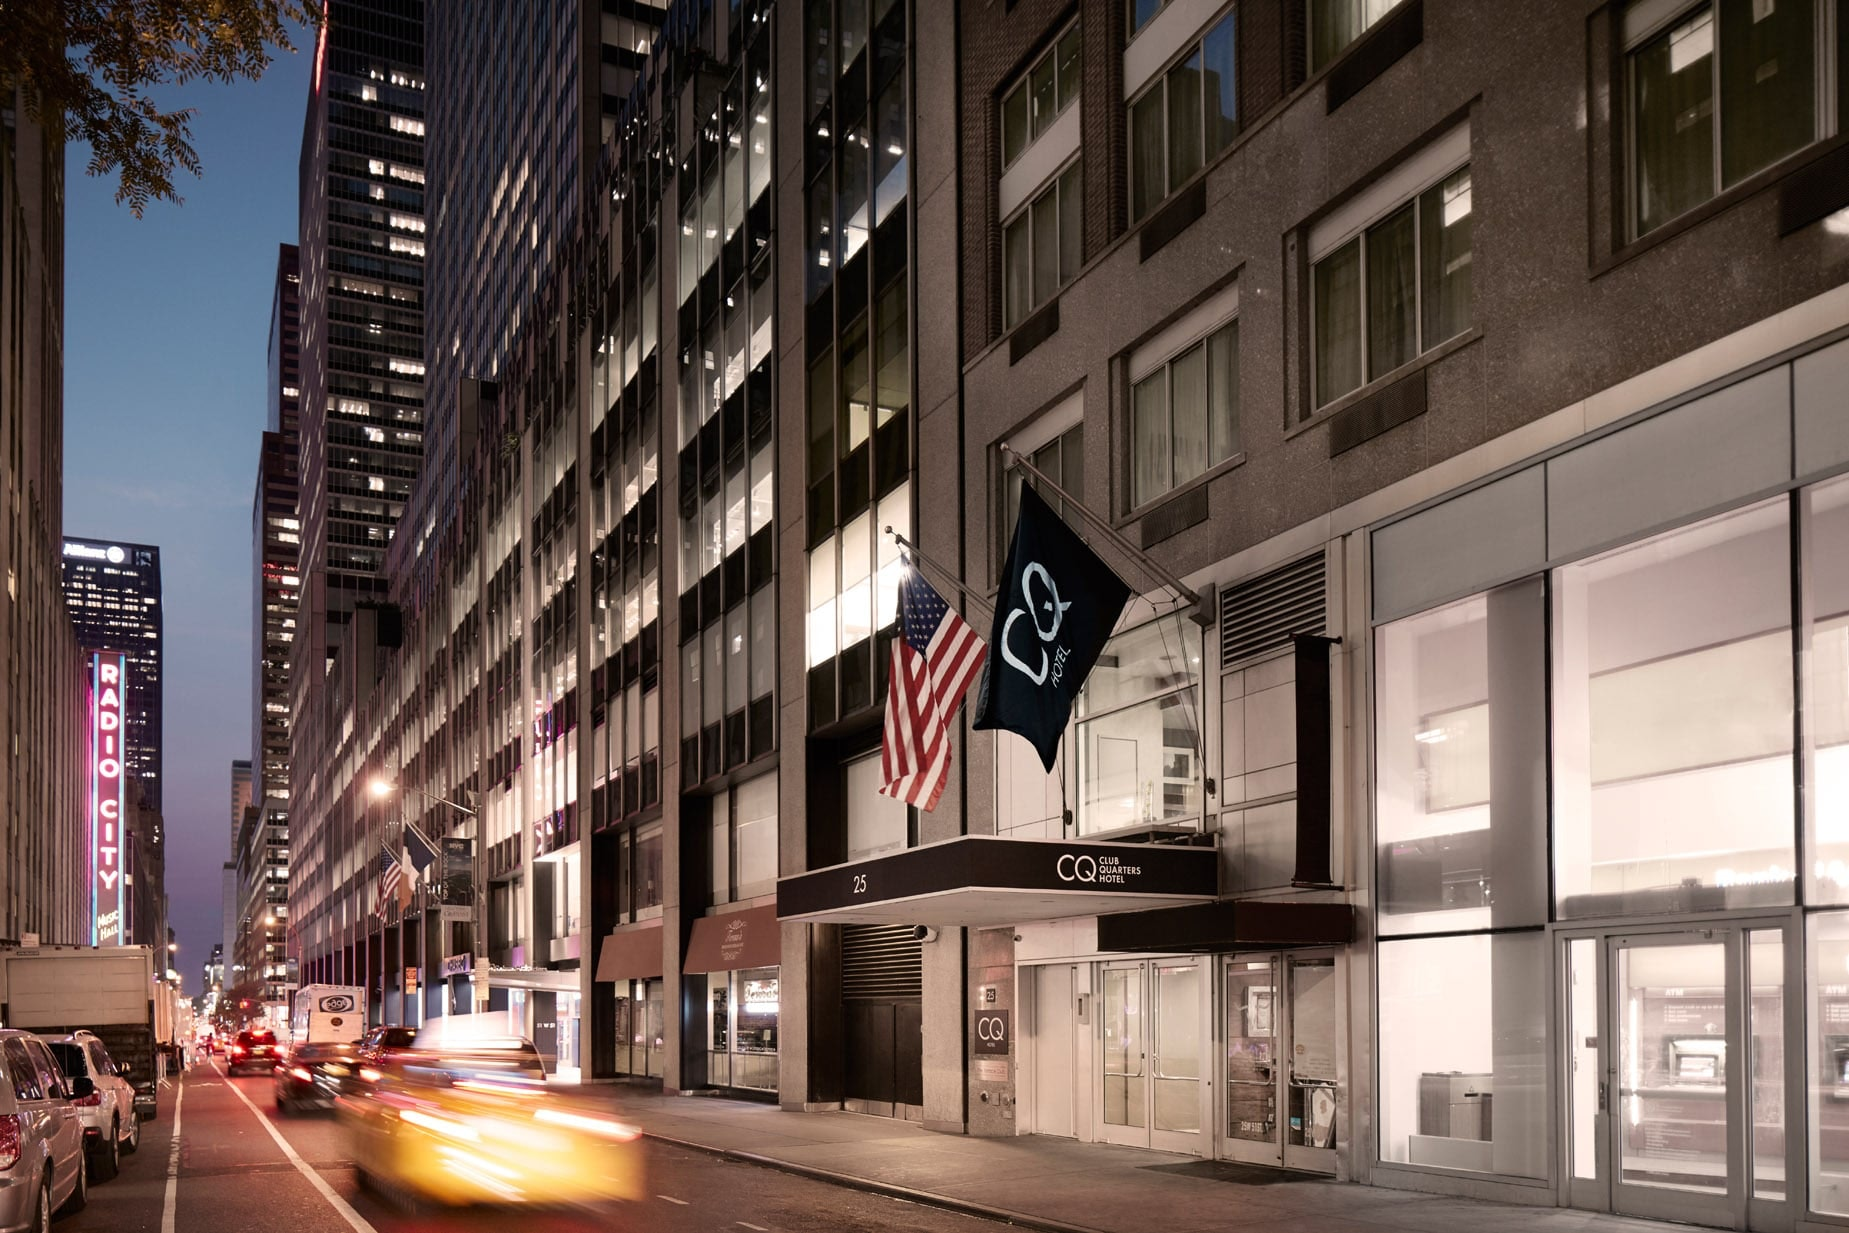 Exterior Of Club Quarters Hotels, Opp Rockefeller Center